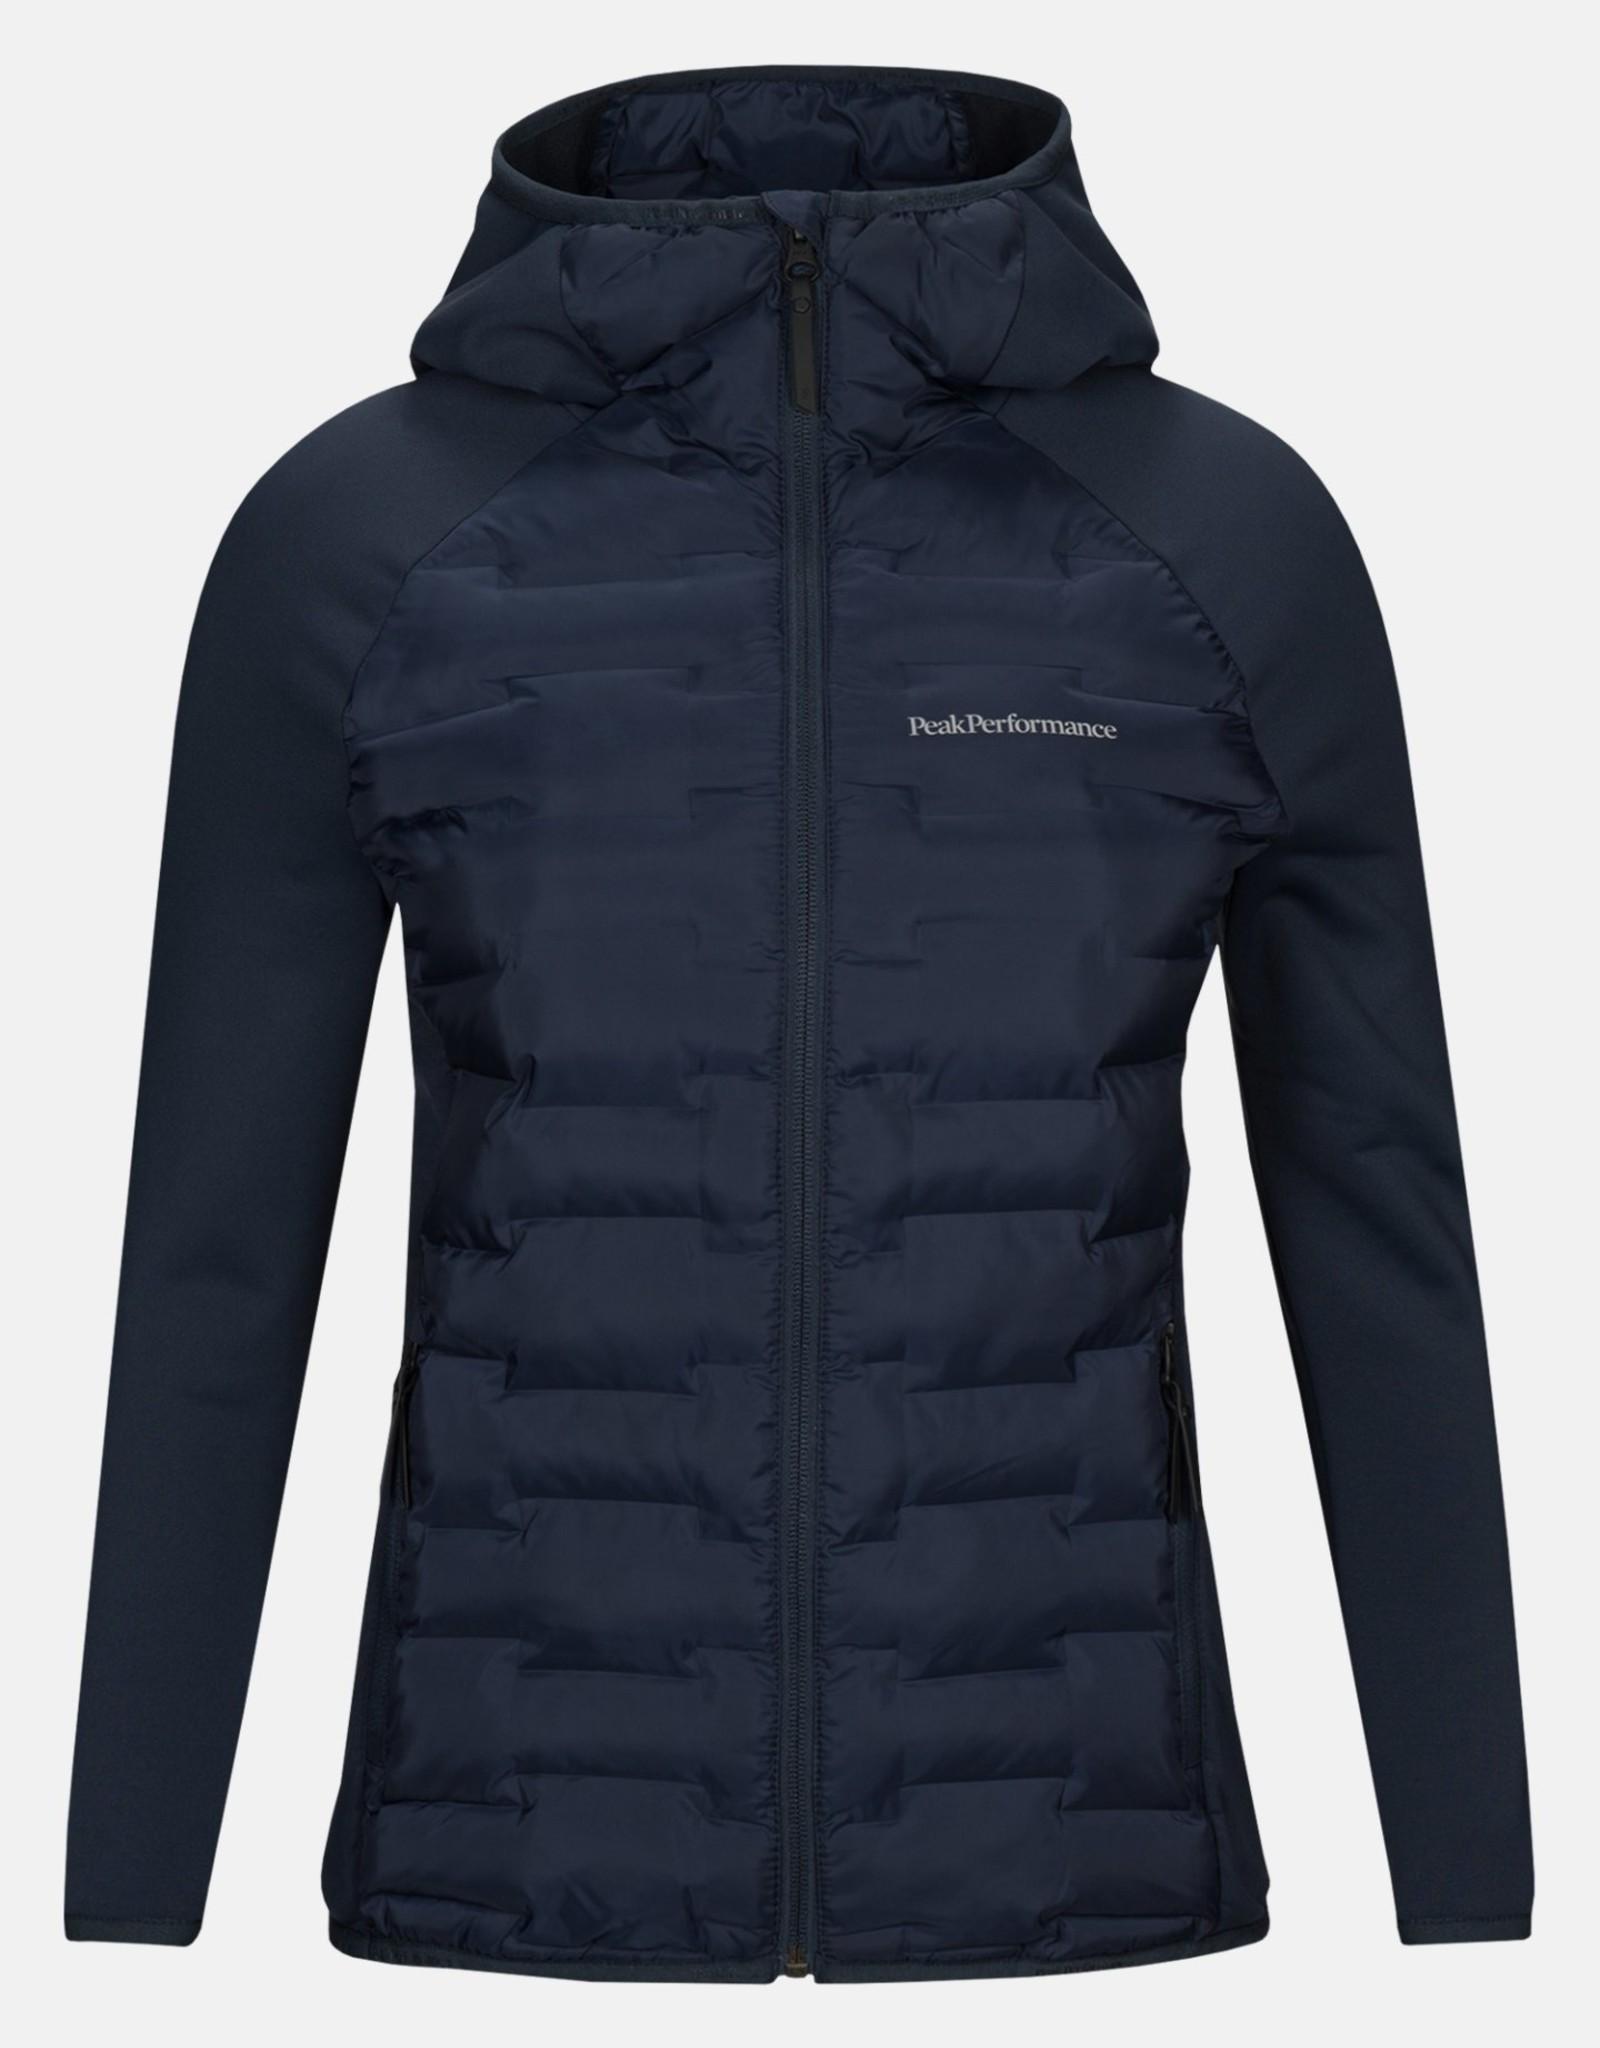 Peak Performance Argon Hybrid hood jacket dames (ref G66901501)